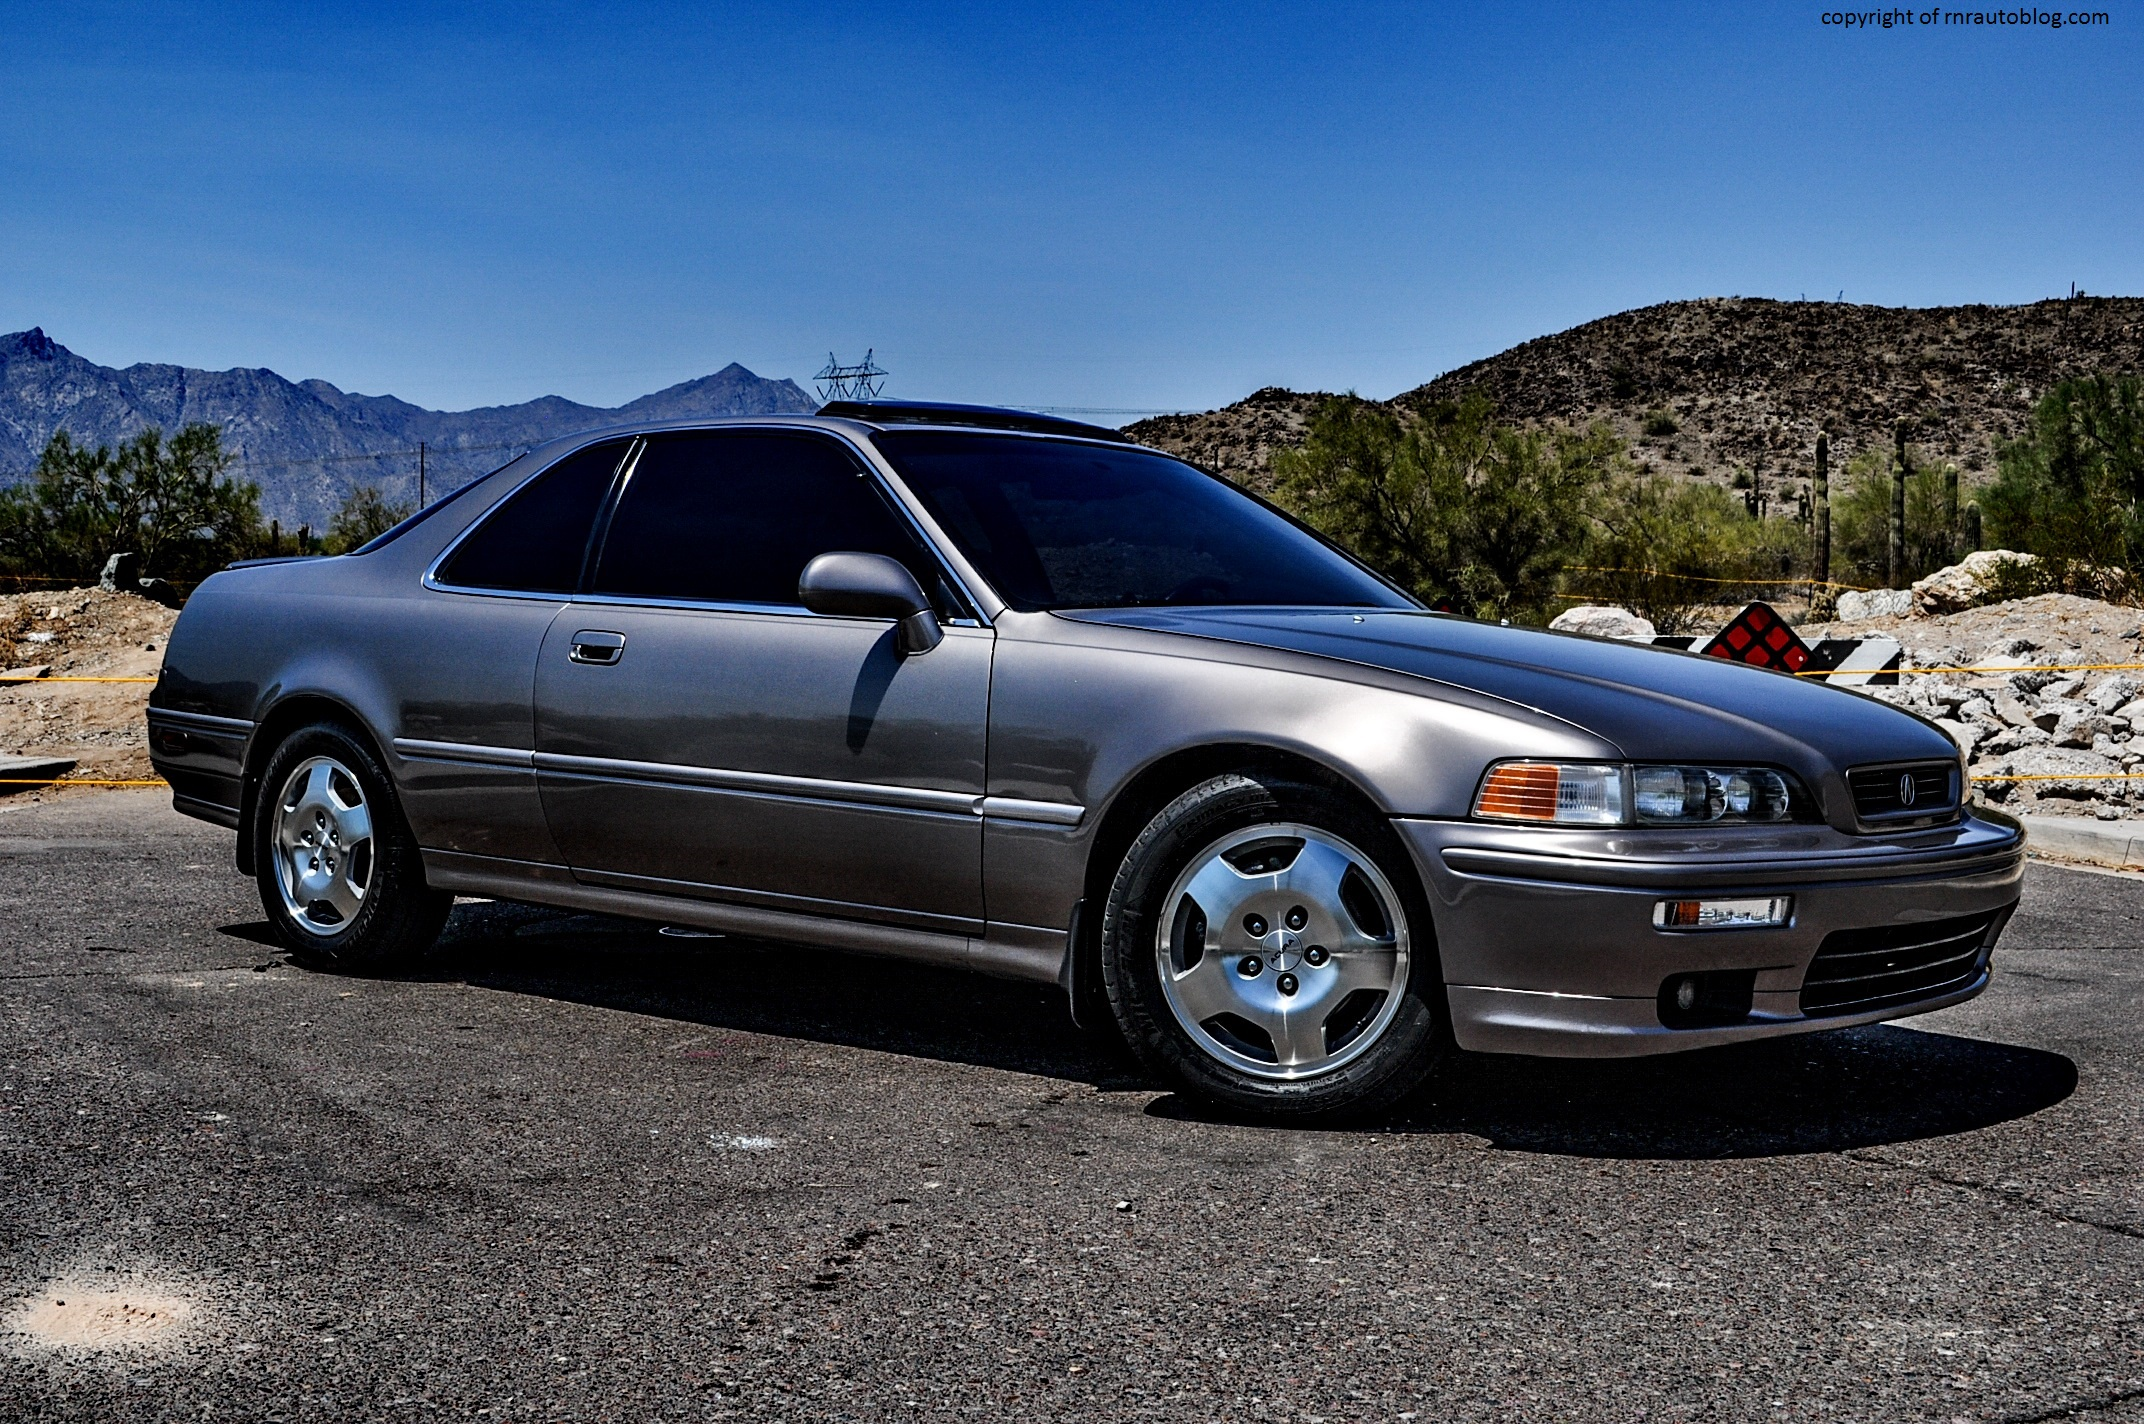 1994 Acura Legend Ls Coupe And Gs Sedan Review Rnr Automotive Blog